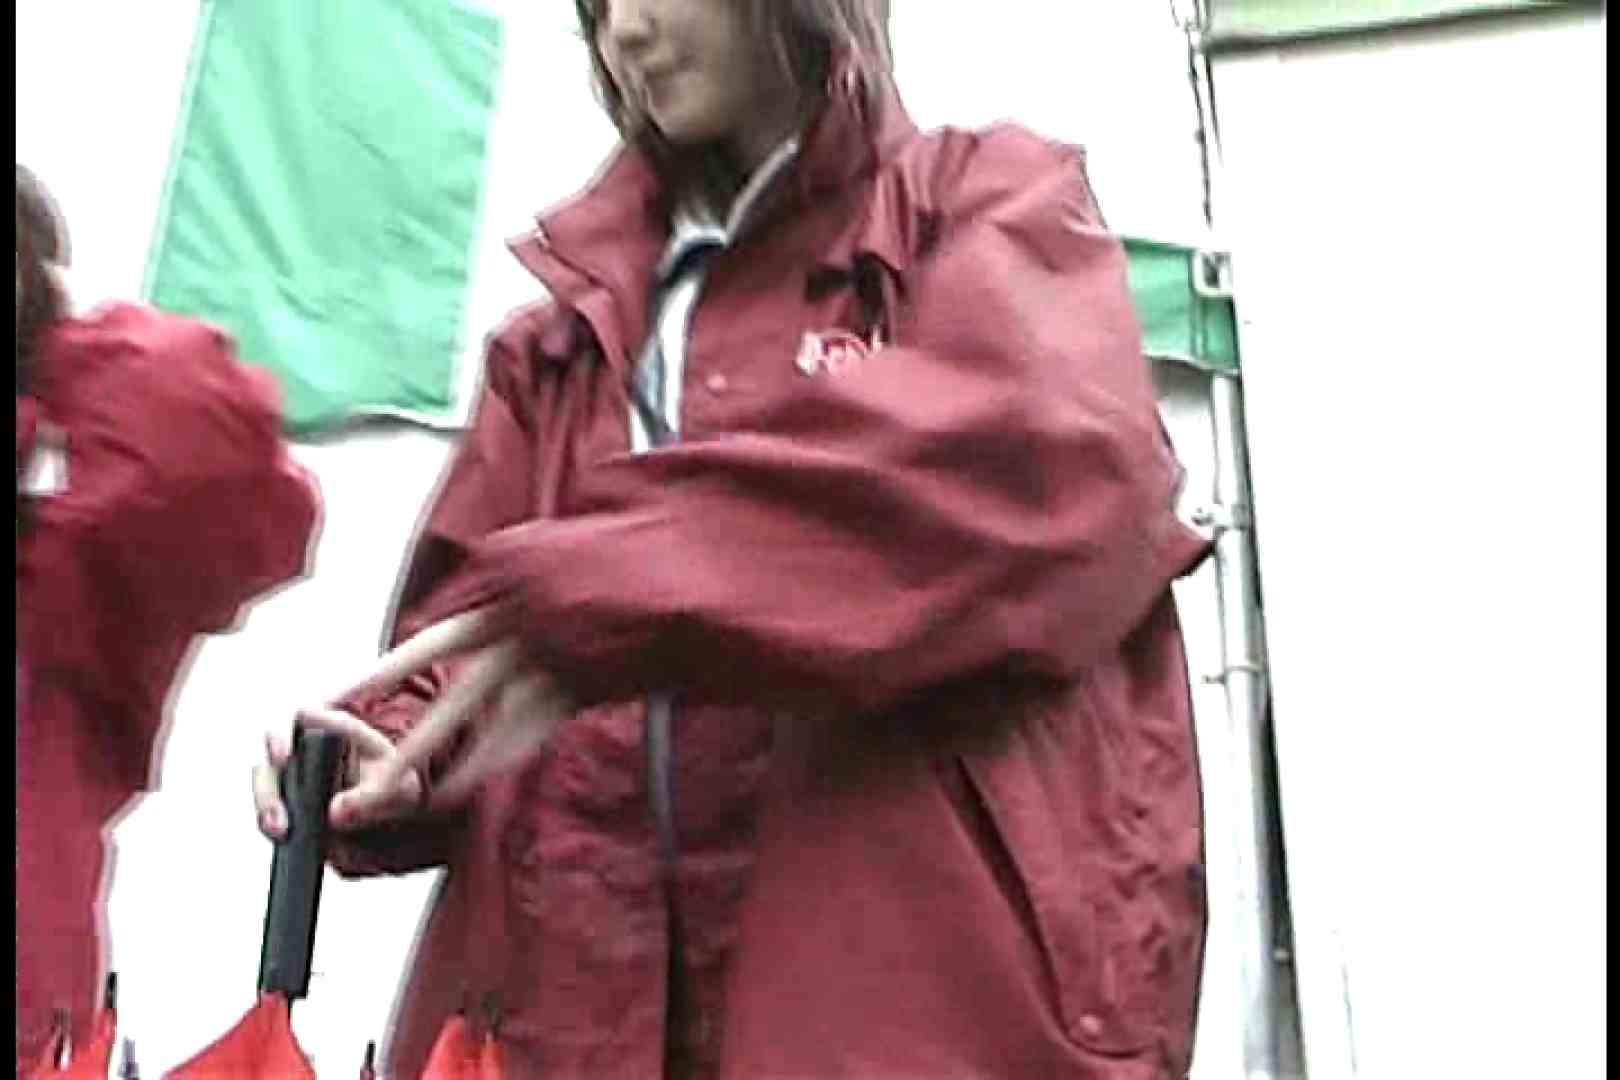 RQカメラ地獄Vol.3 美女OL   レースクイーン  83連発 15